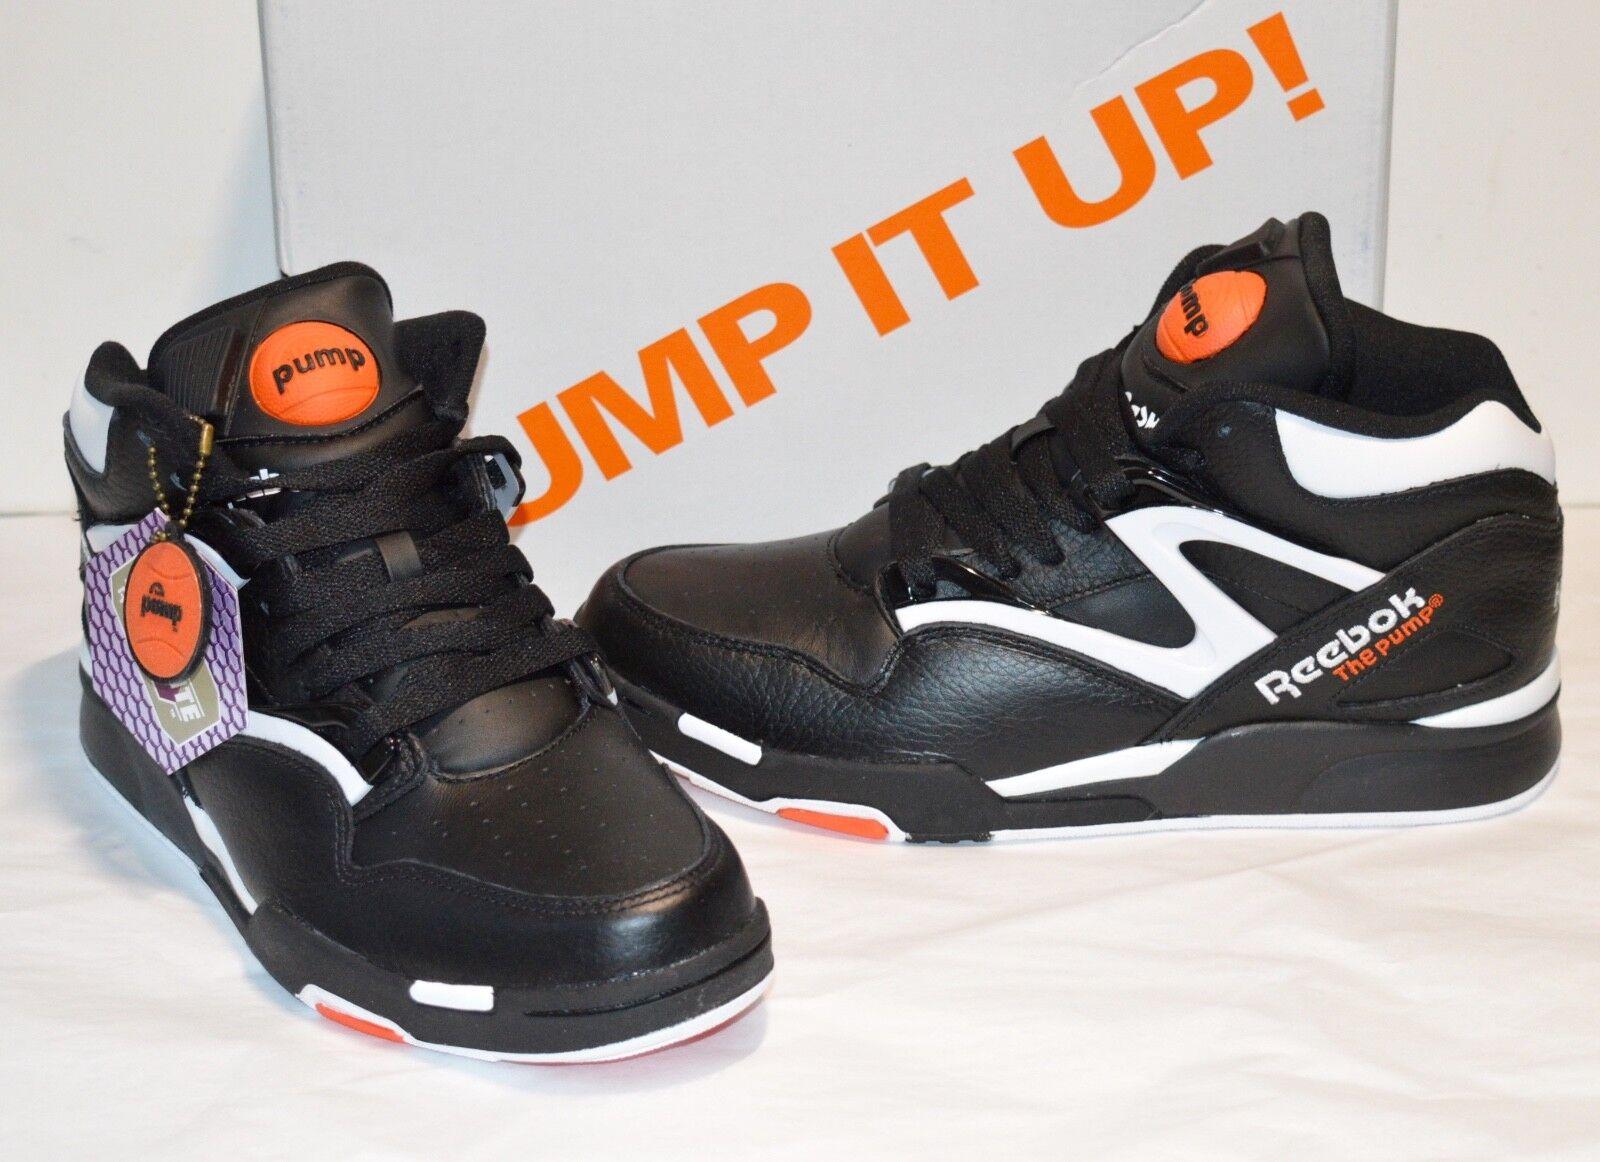 Wholesale price Reebok Pump Omni Lite Retro Basketball Shoes